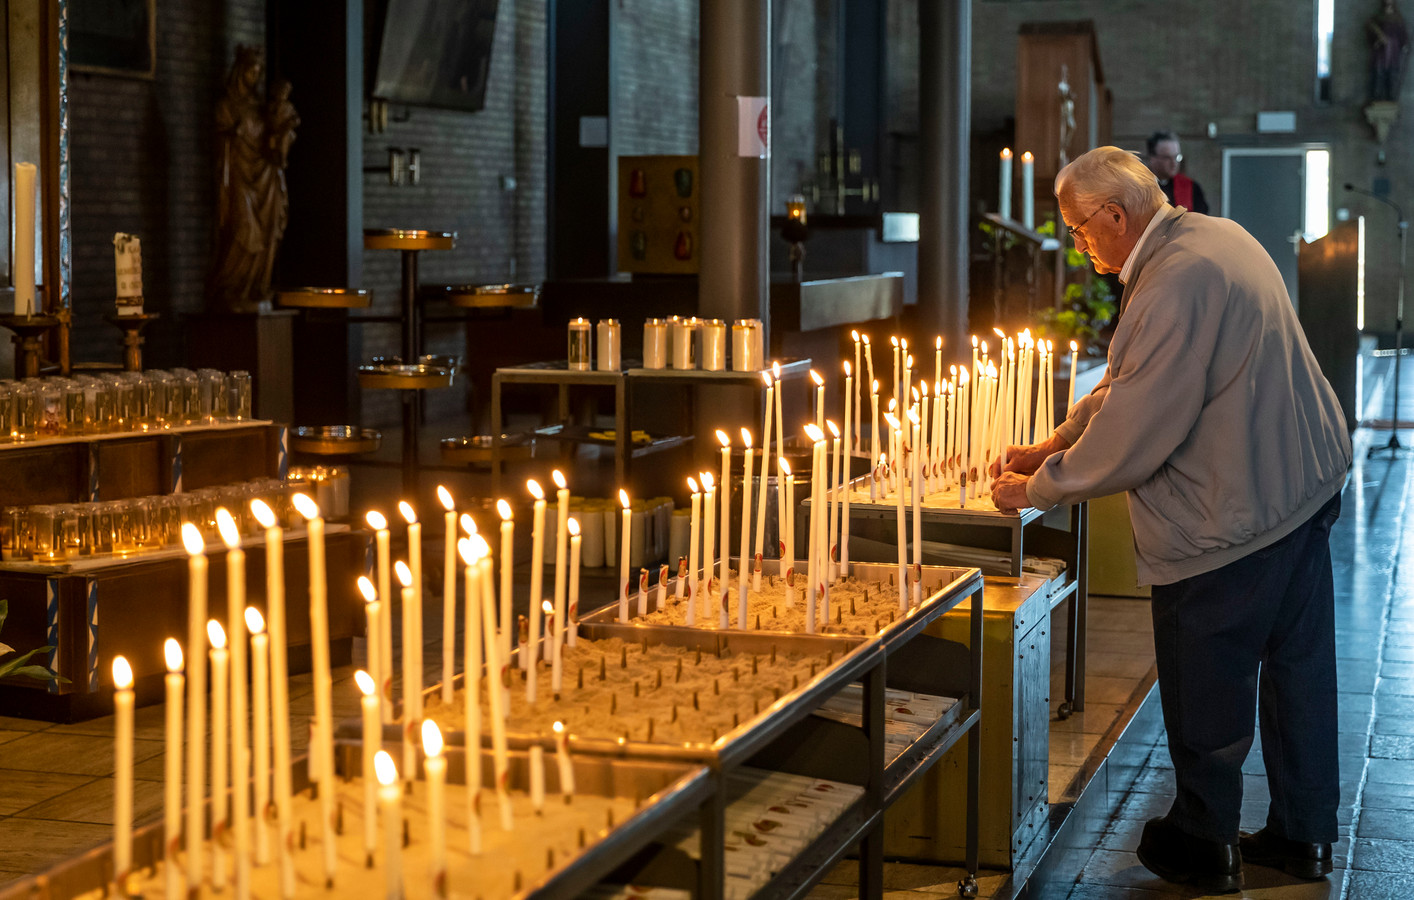 Een kaarsje opsteken in de kerk in Ommel. Foto ter illustriatie.